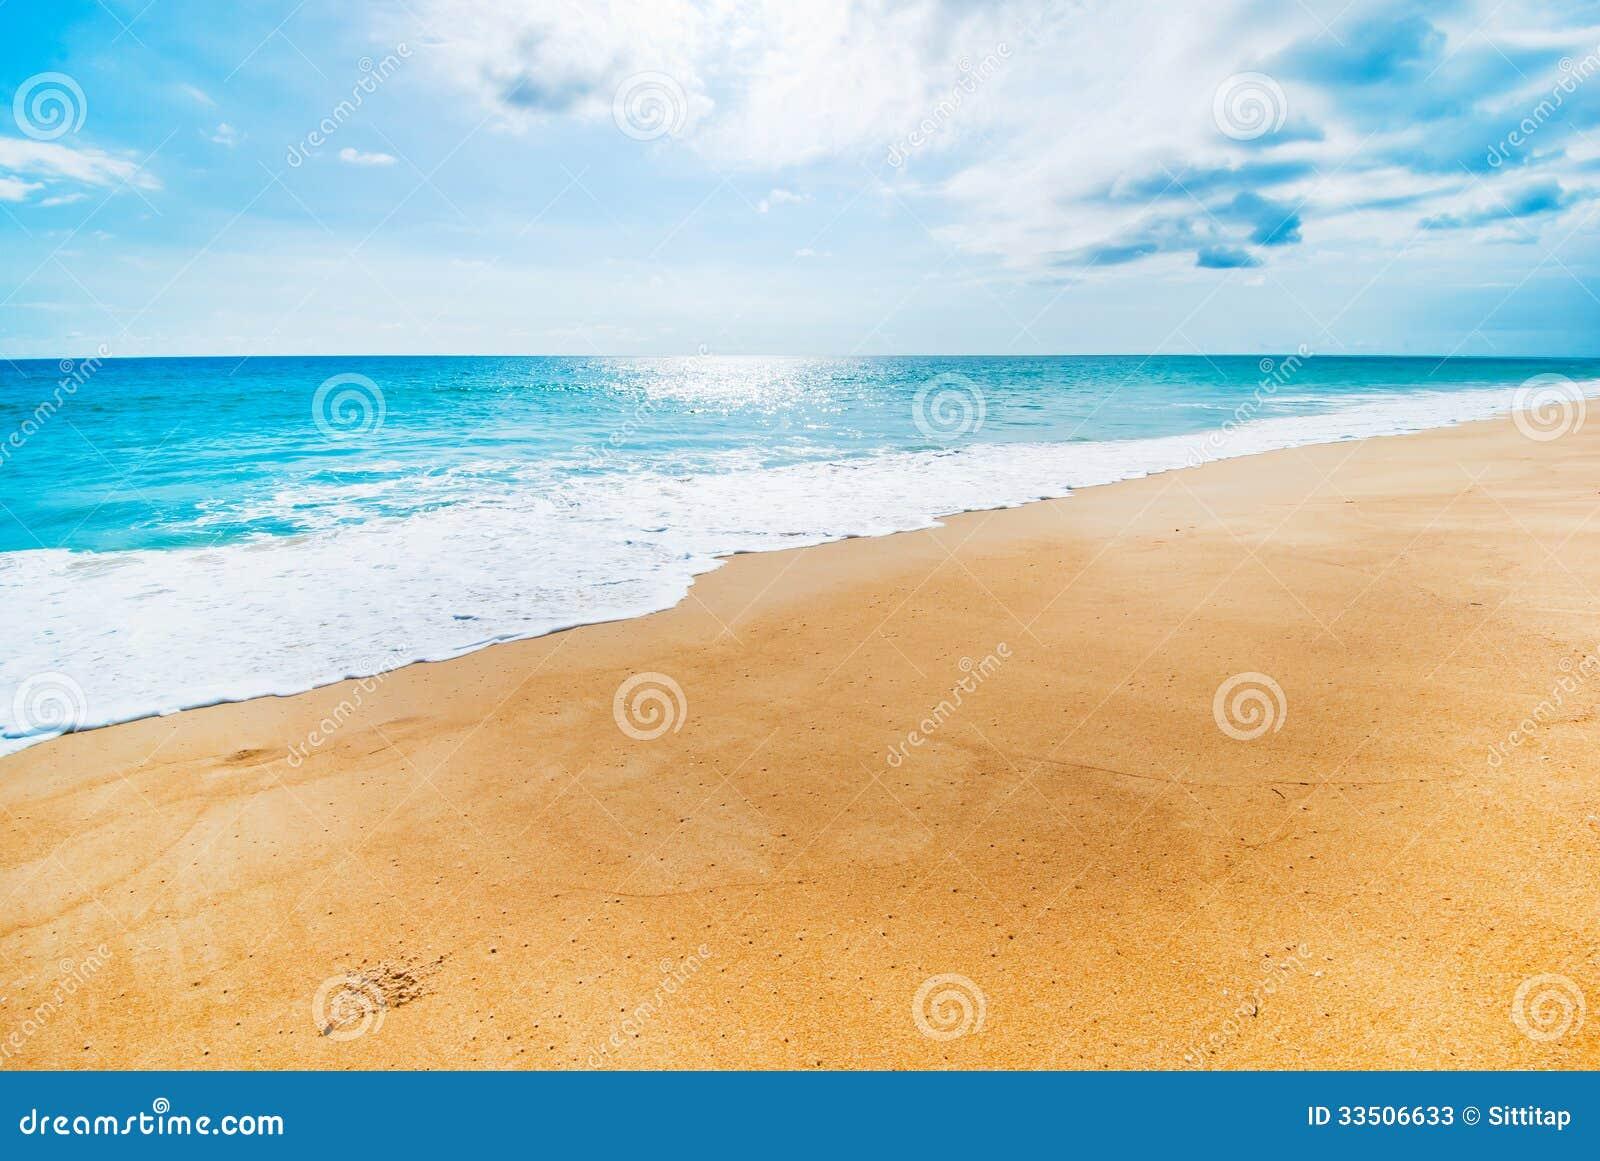 sky sea beaches - photo #8